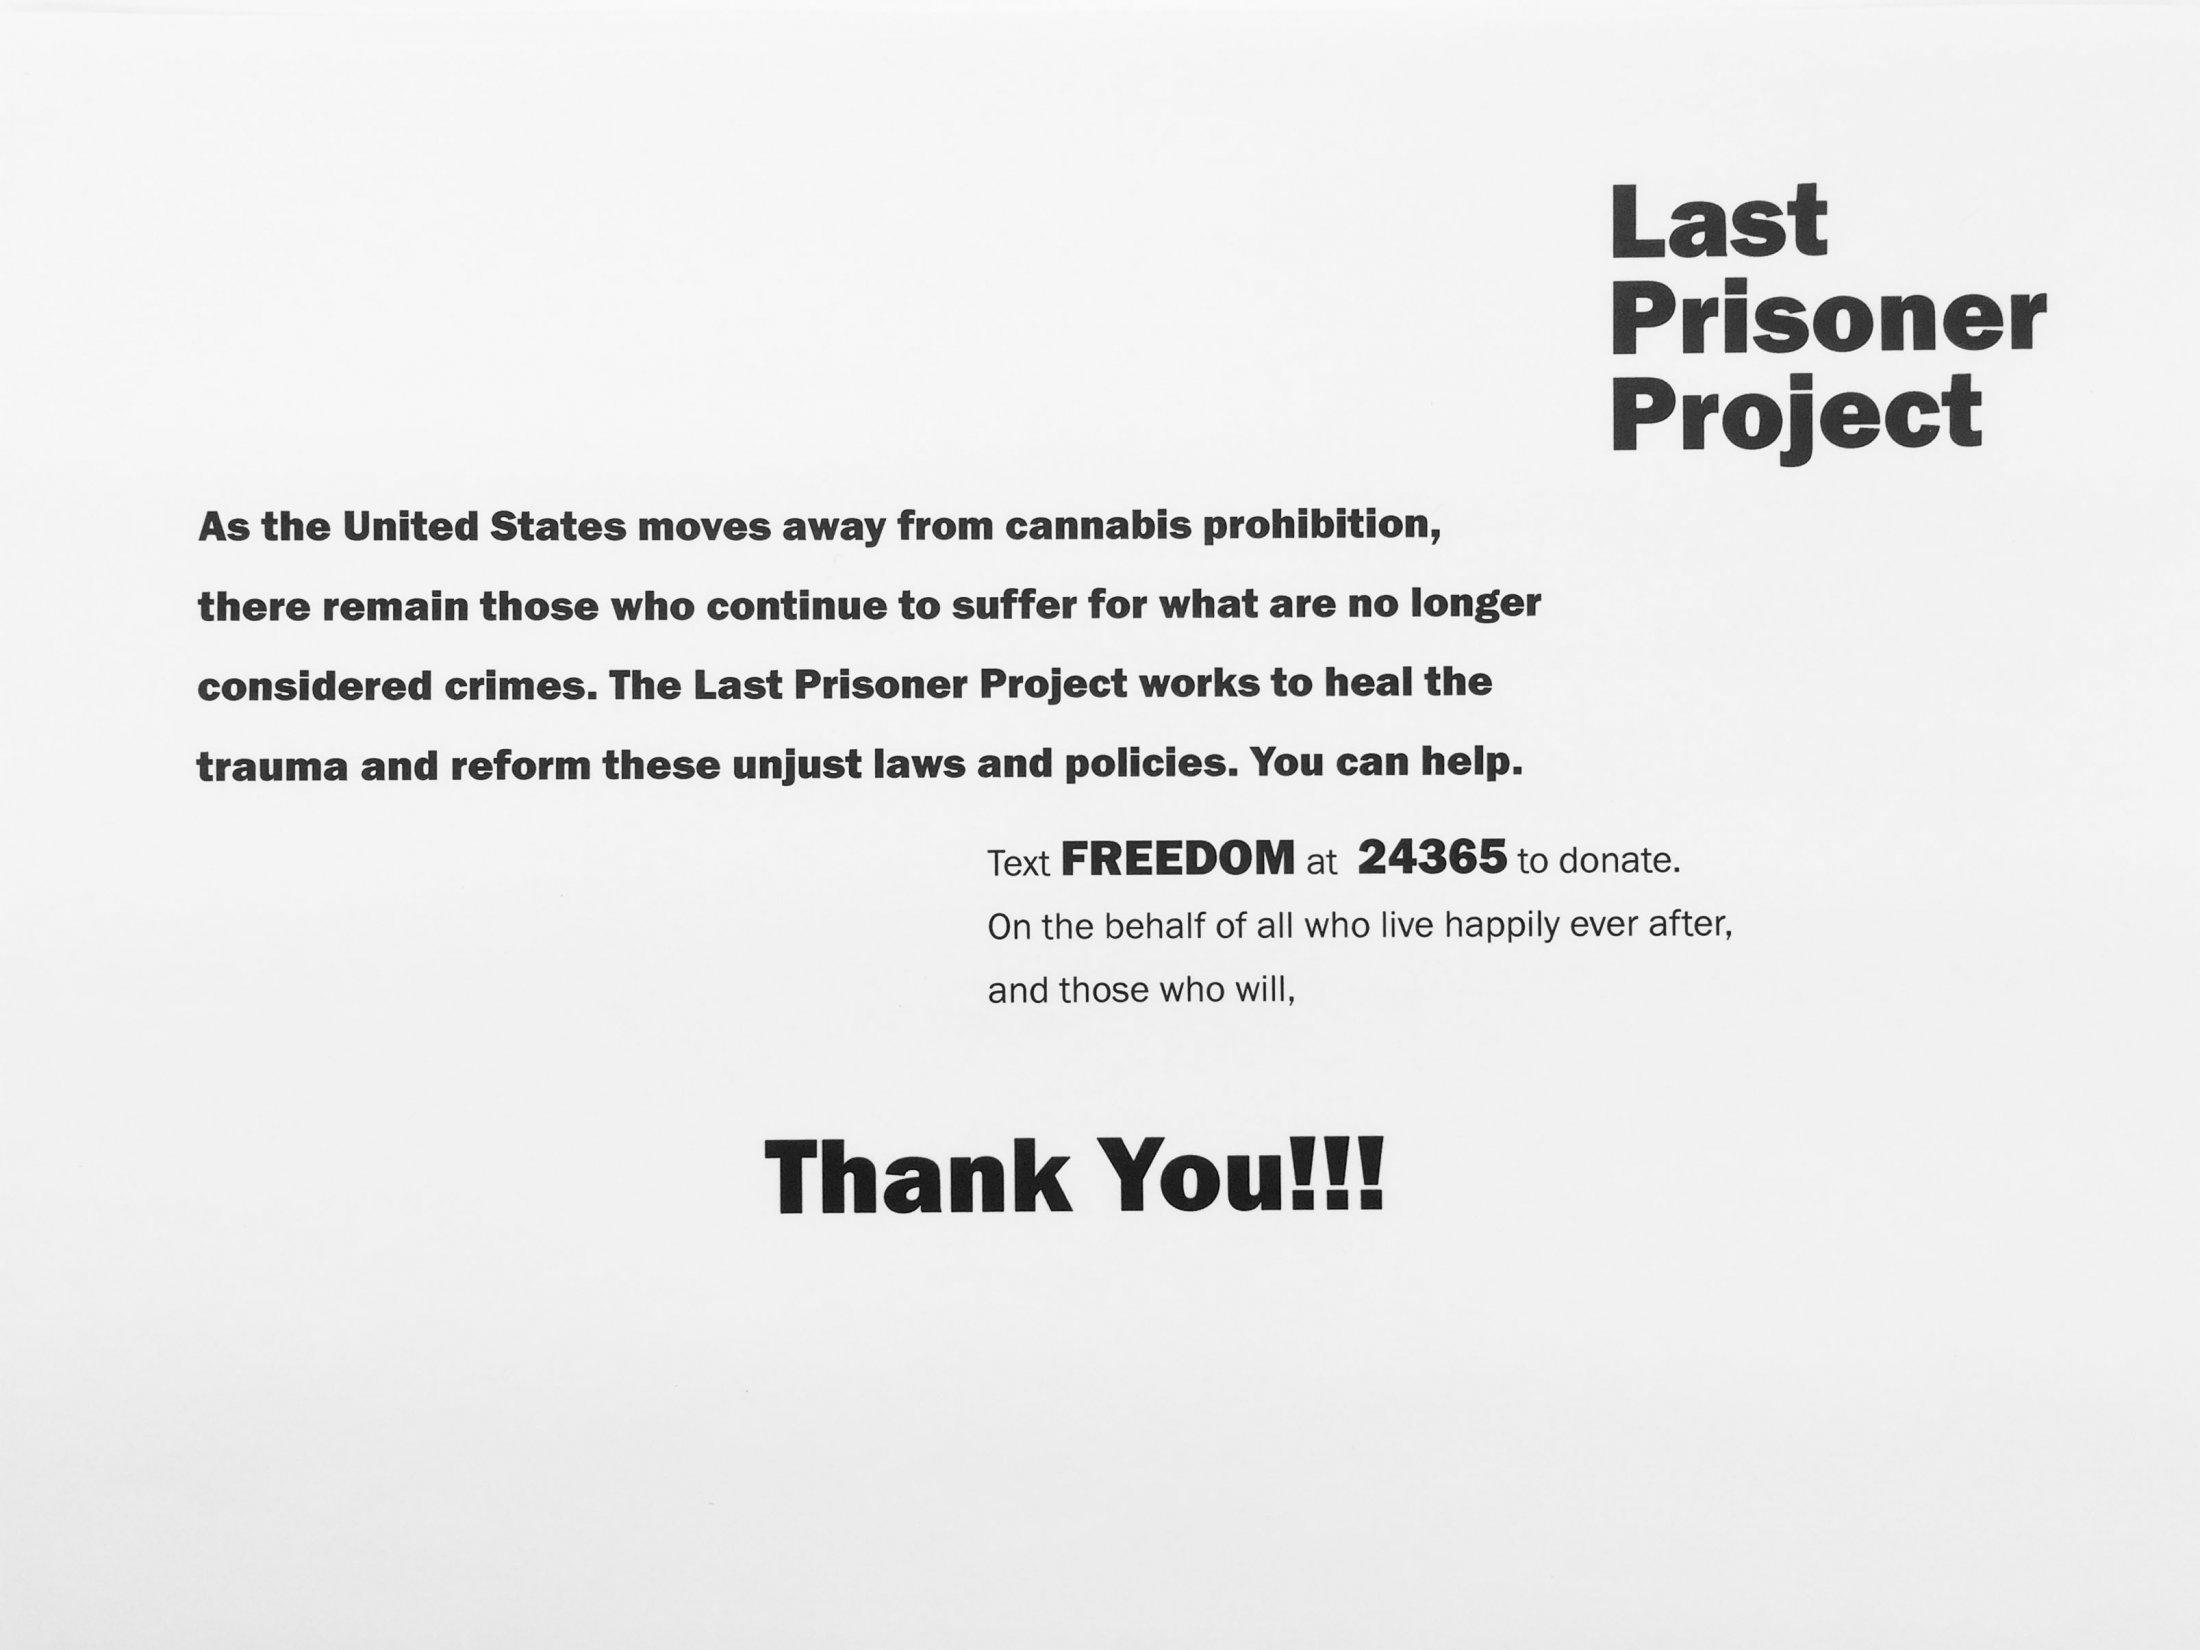 Last Prisoner Project: Last Prisoner Project